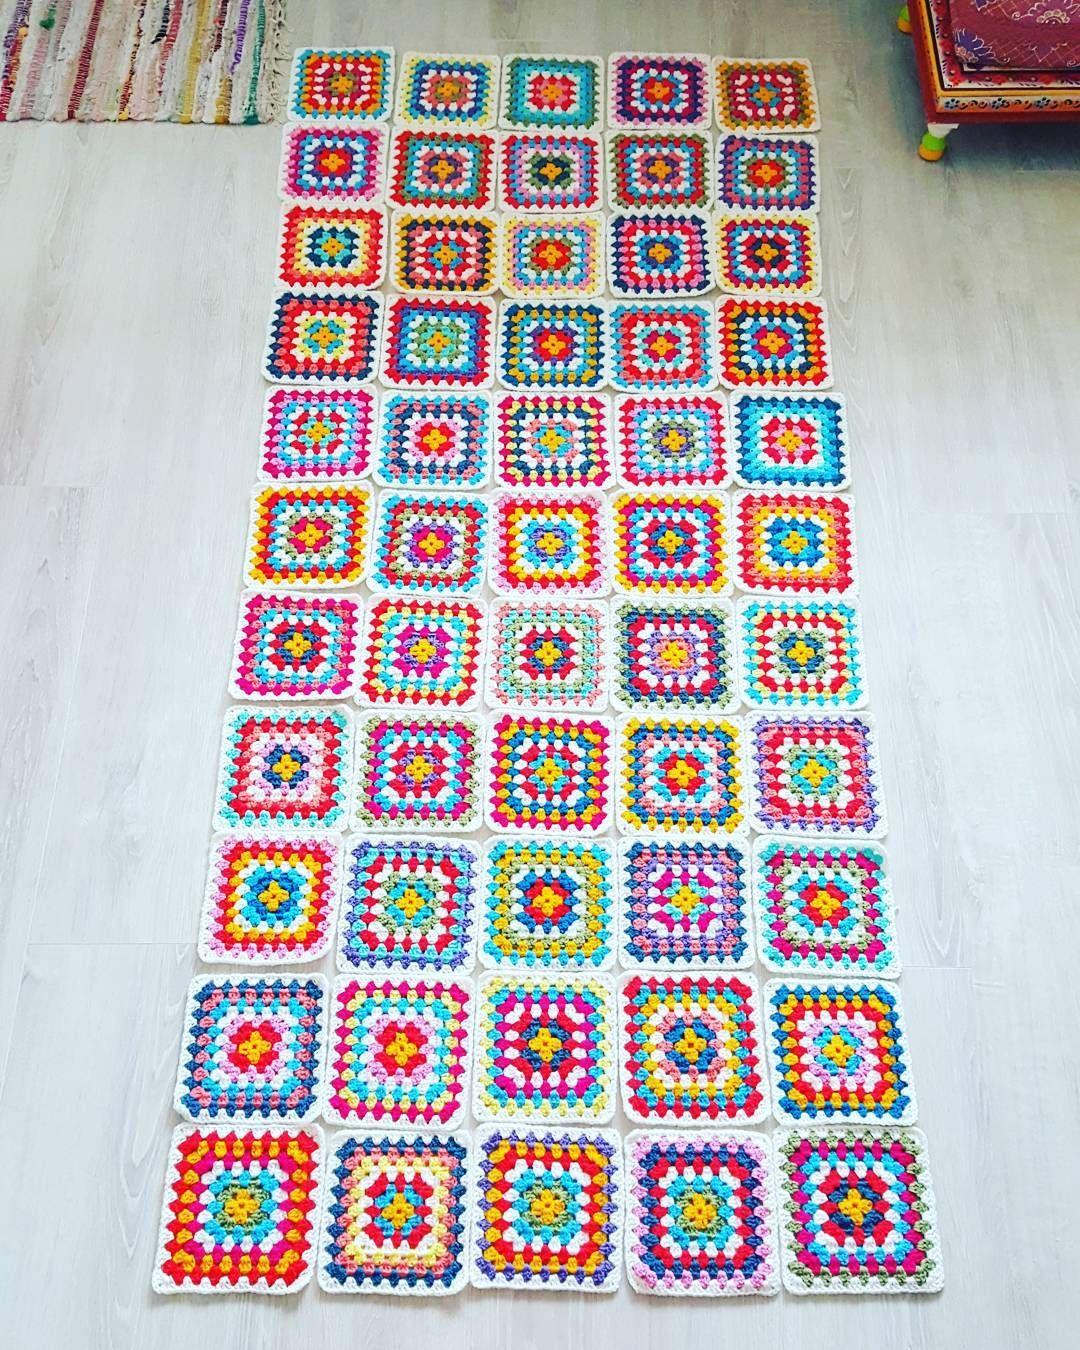 Puzzle #grannysquare #grannysquareblanket #stylecraft #stylecraftspecialdk #crochetgirlgang #craftastherapy #sharethecrochet #crochet #haken #häkeln #virkat #happycolors #bohemiancrochet #colorfullife #lovecrochet #crochetersofinstagram